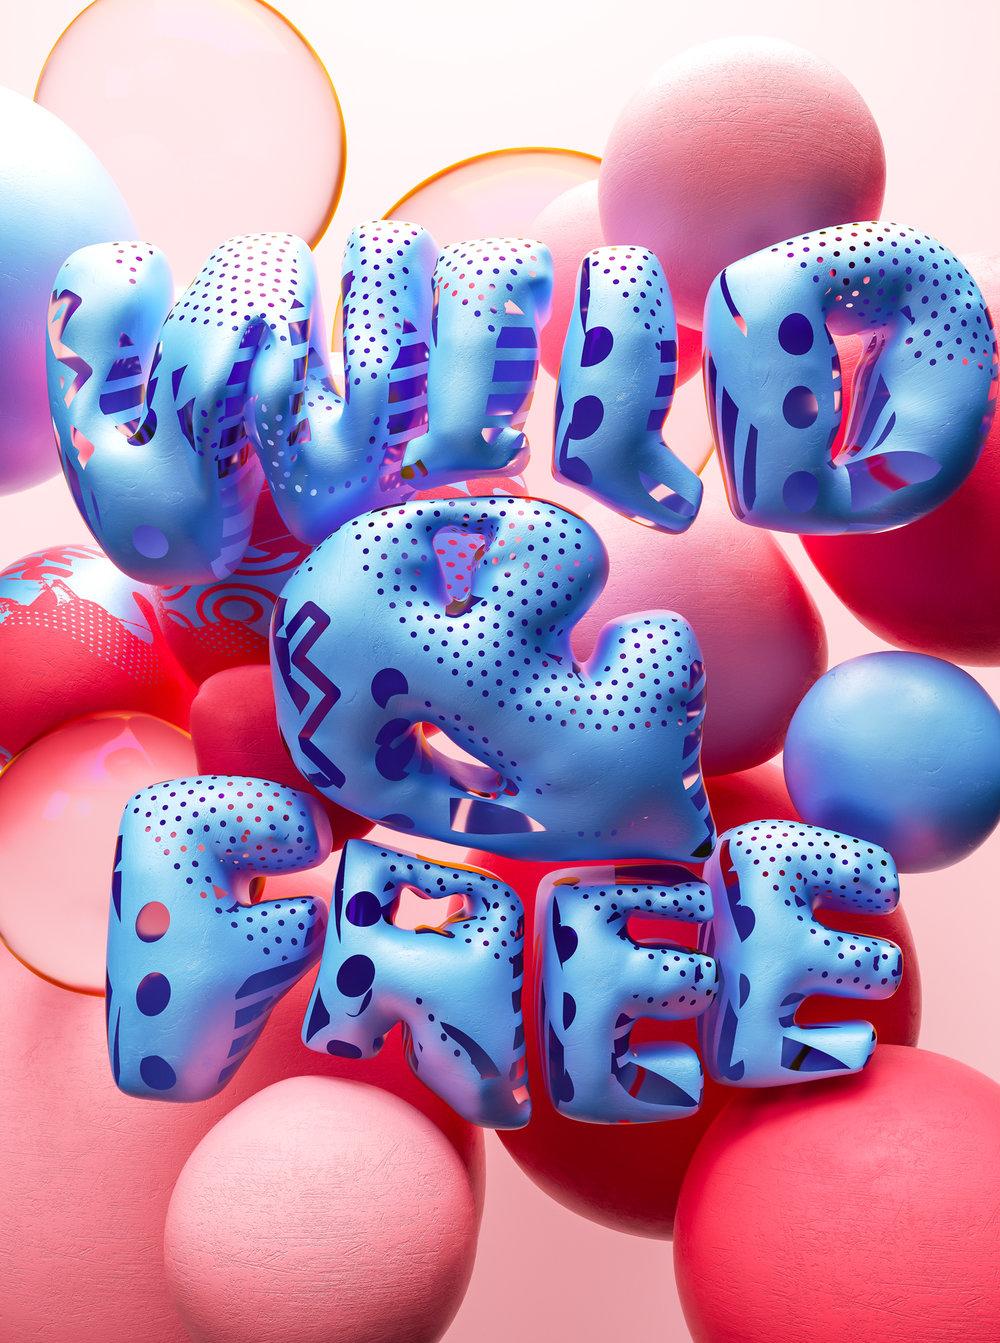 InflatedType_WildAndFree.jpg